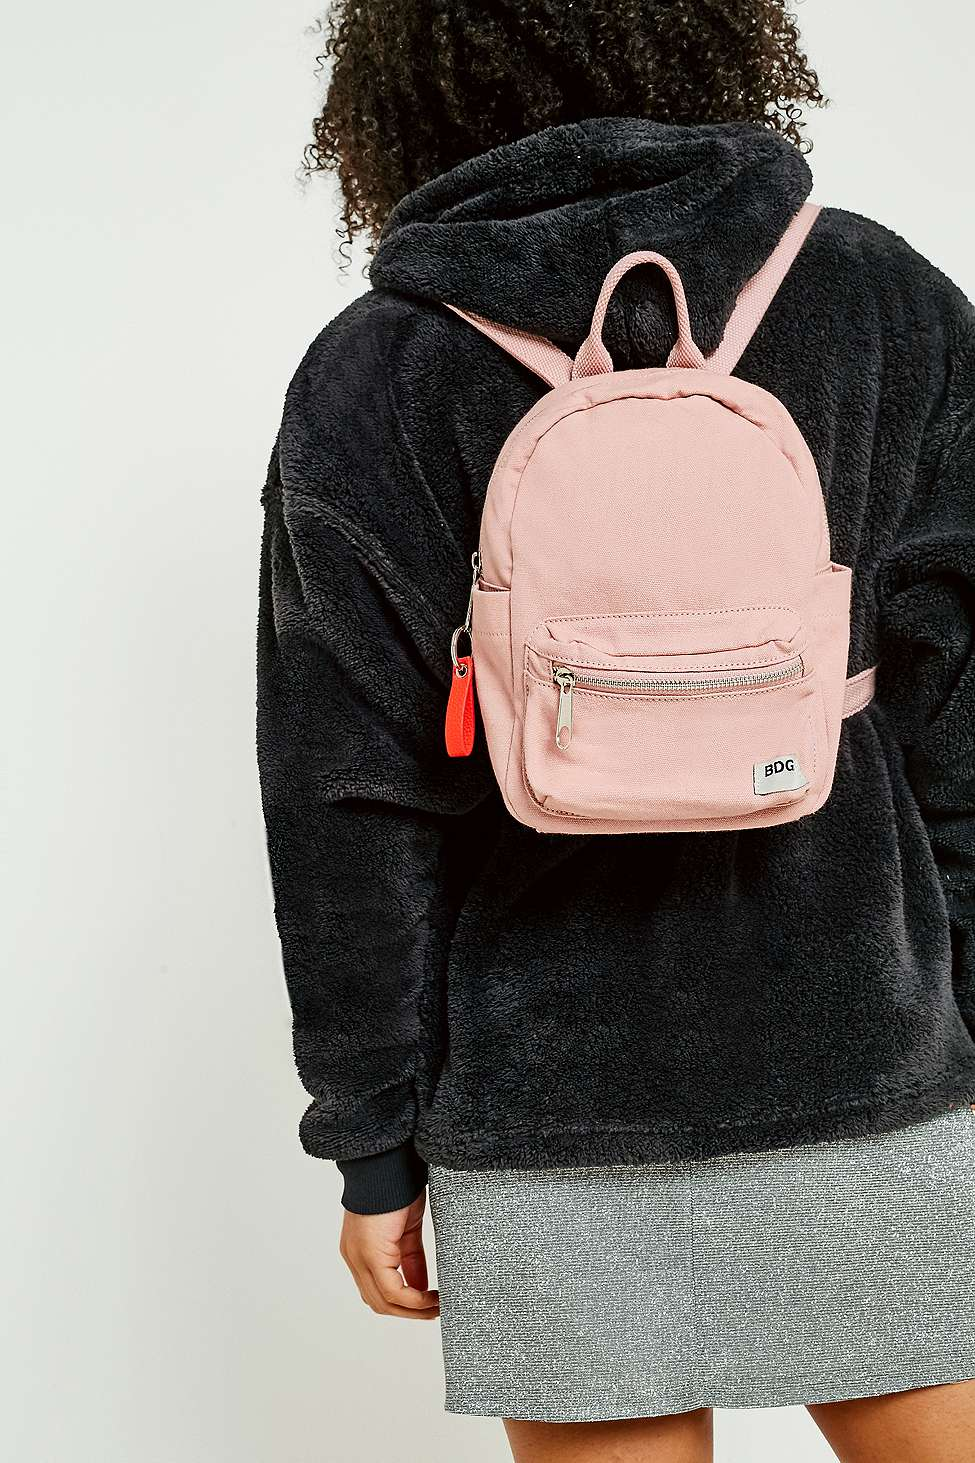 BDG Canvas Mini Backpack, Rose